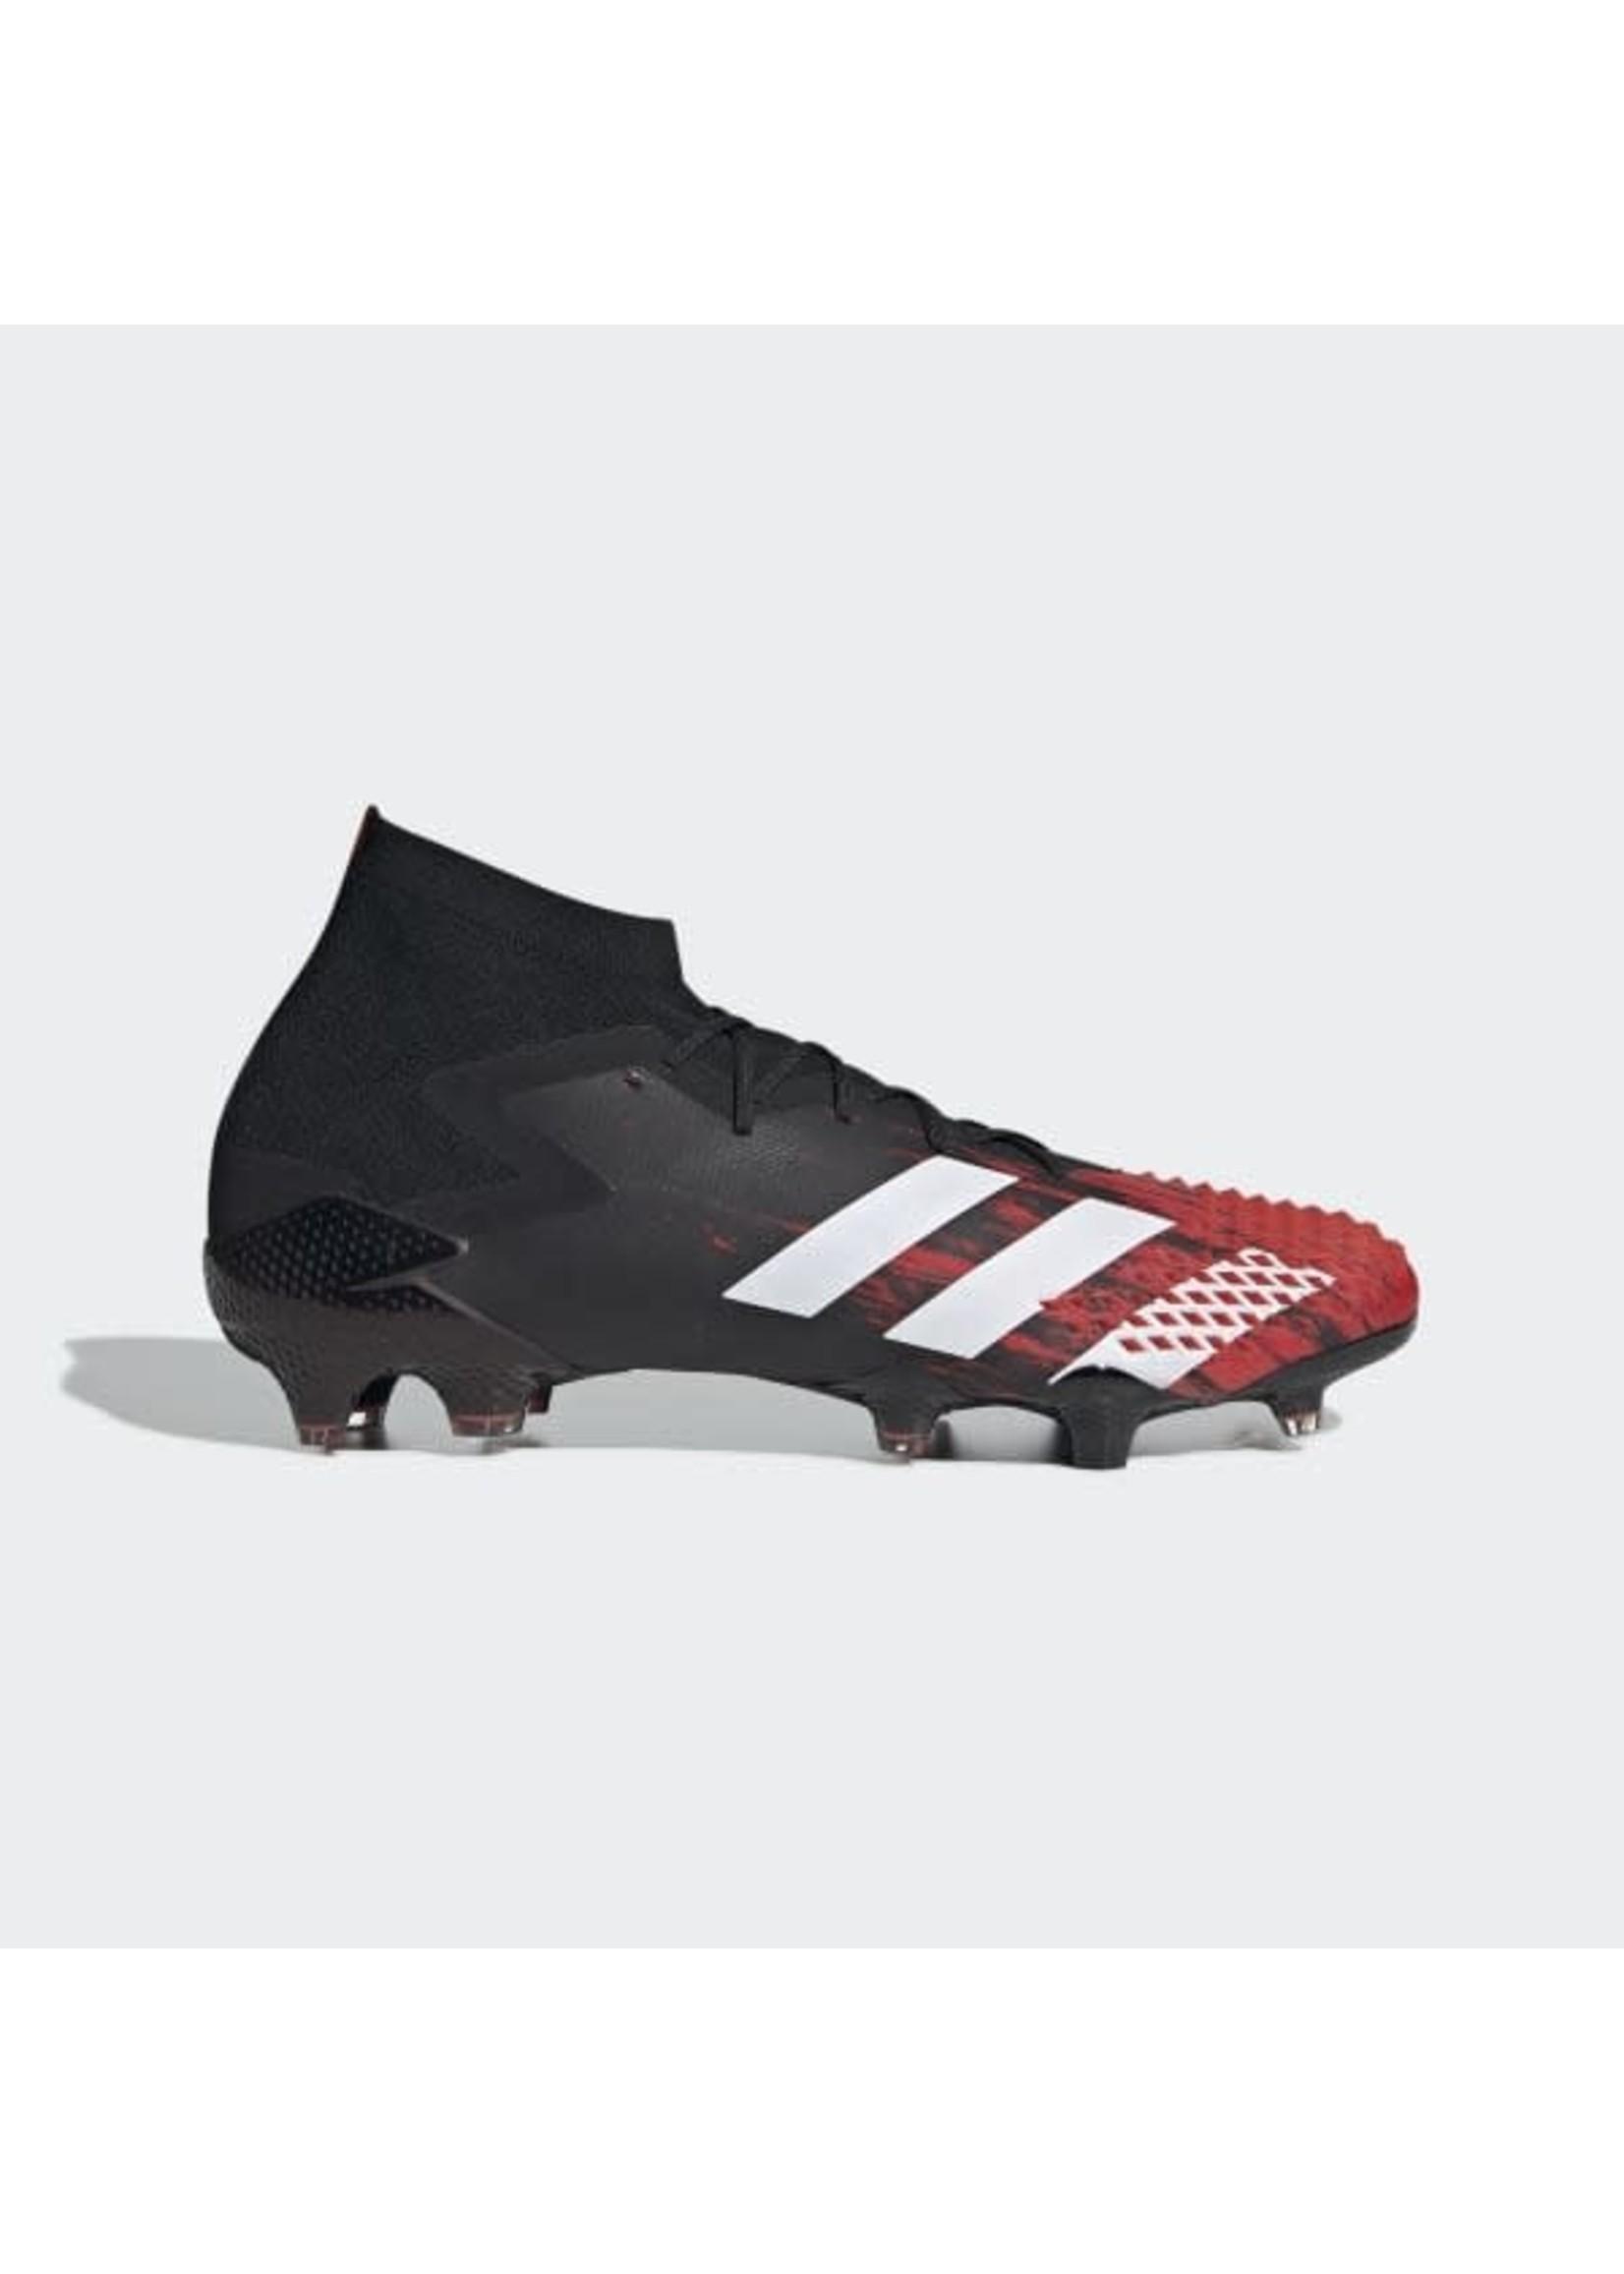 Adidas PREDATOR MUTATOR 20.1 FG